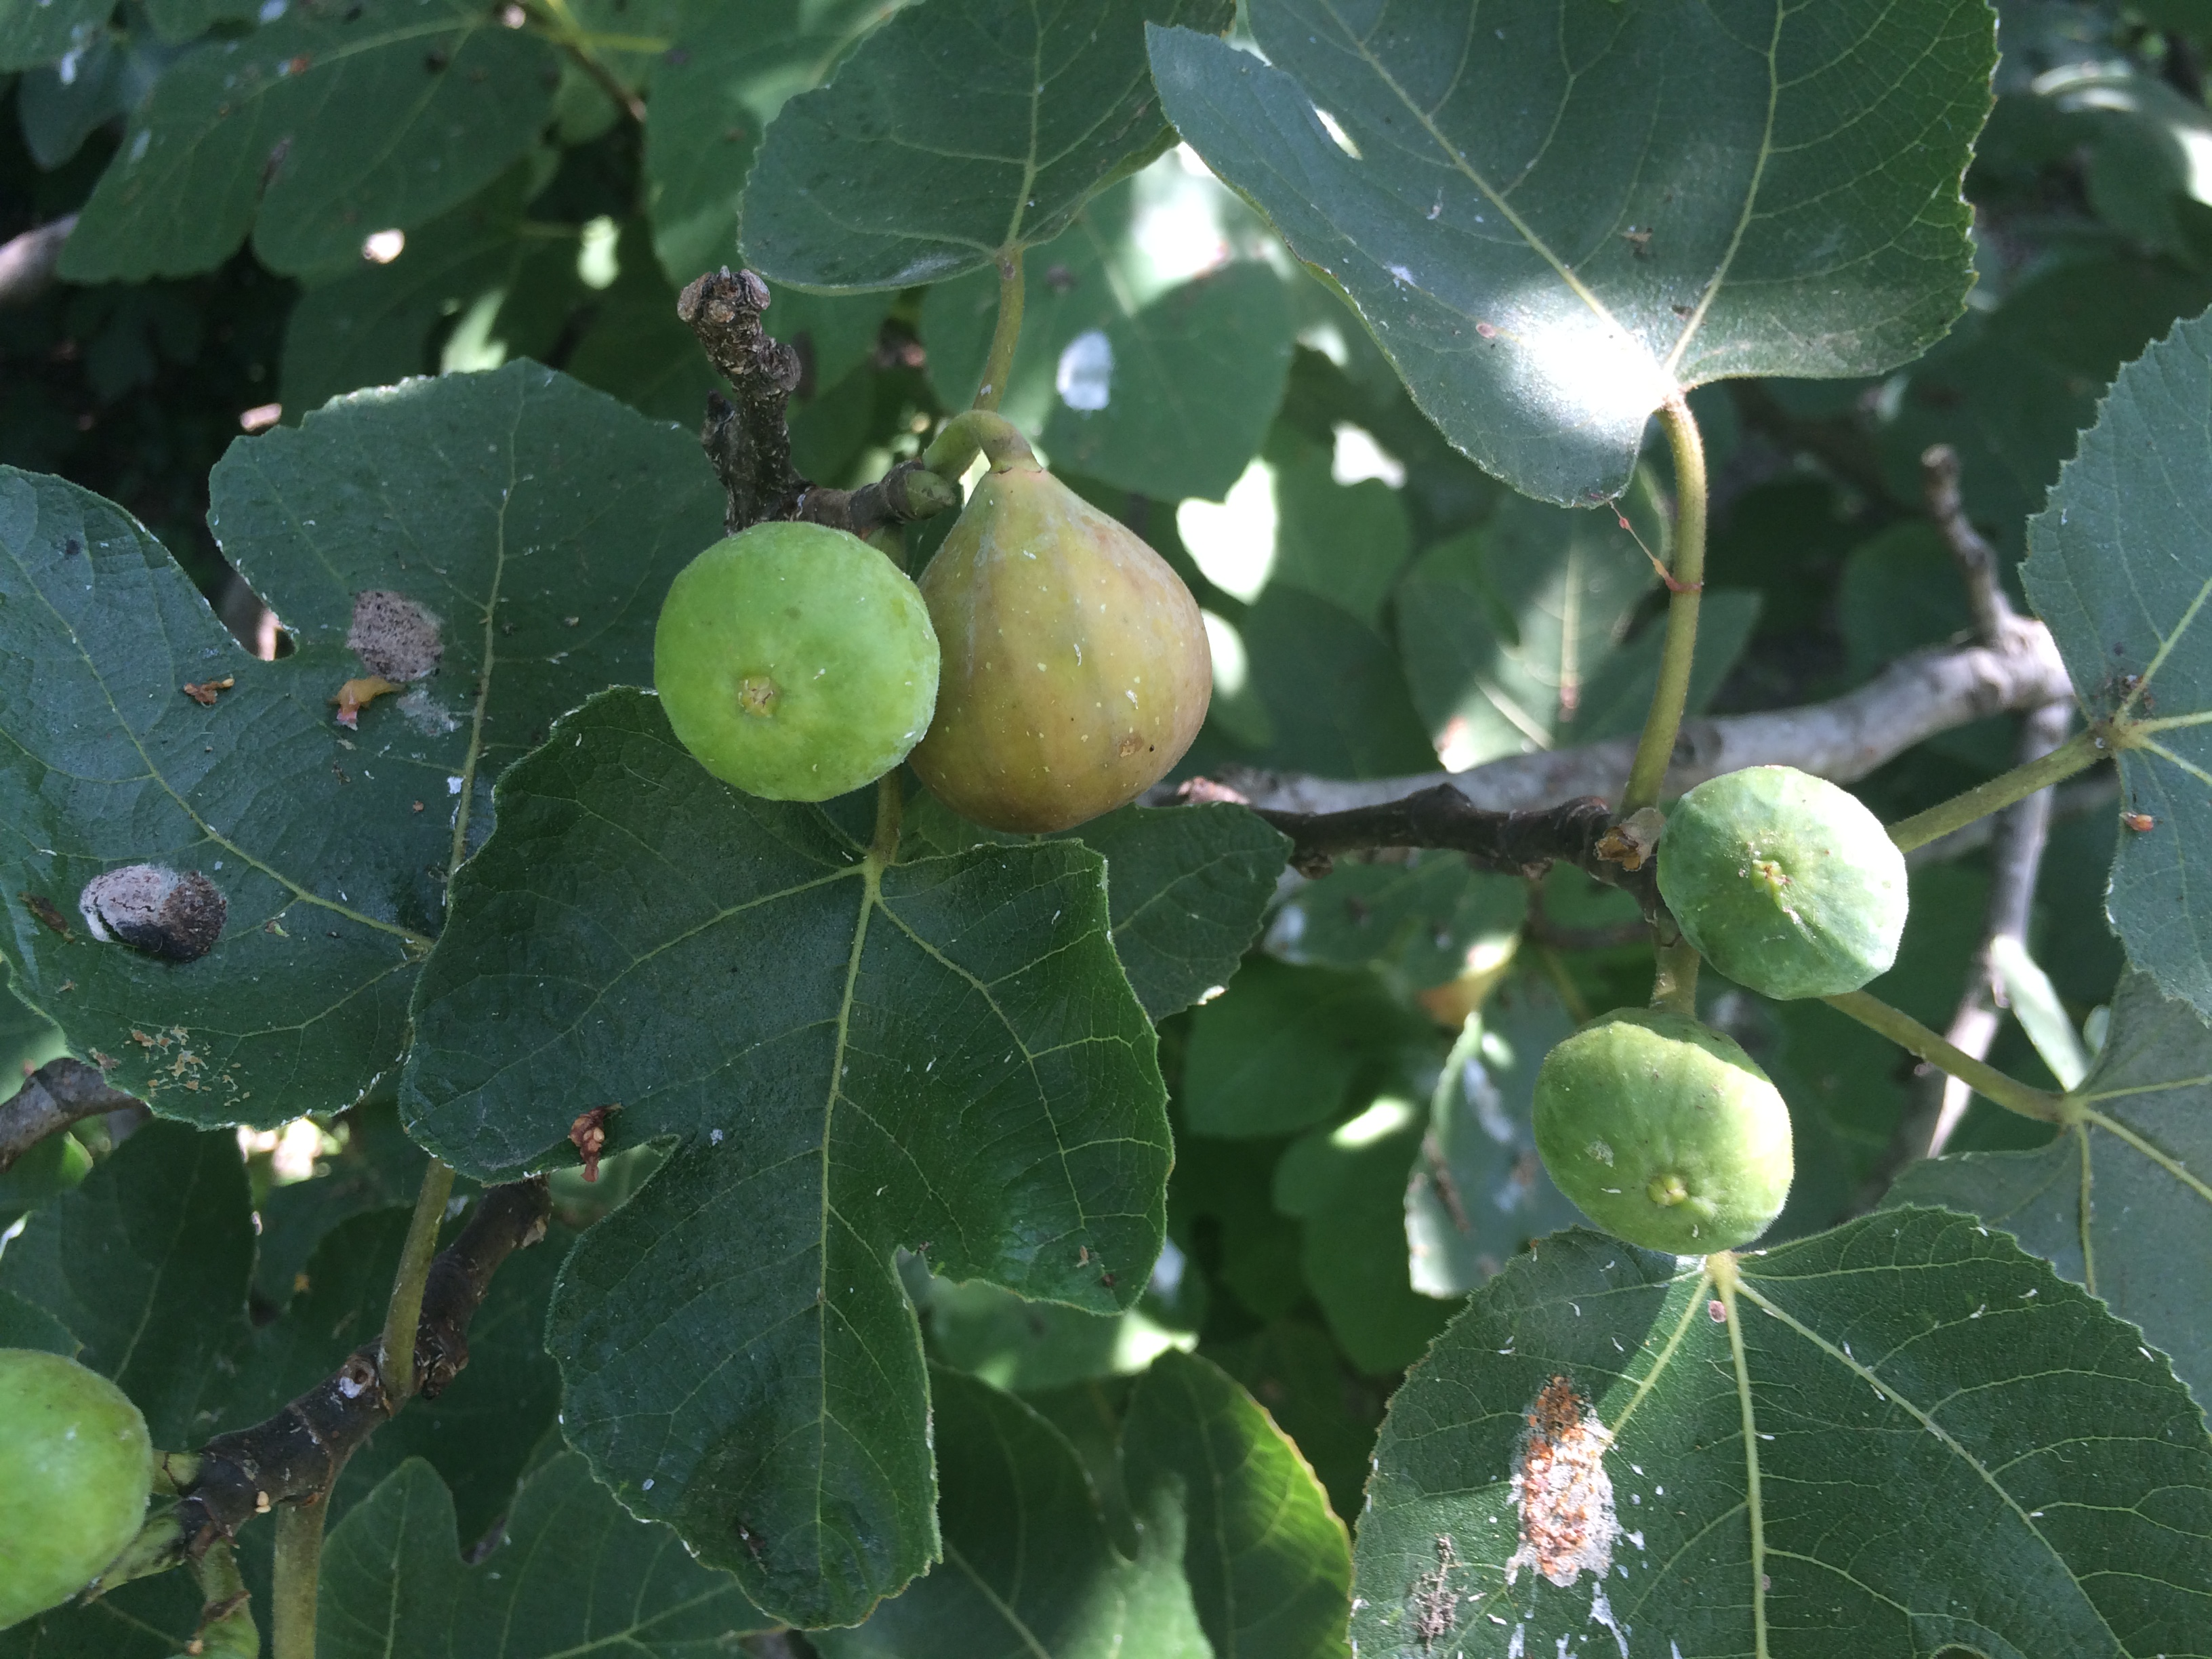 Fresh figs on tree